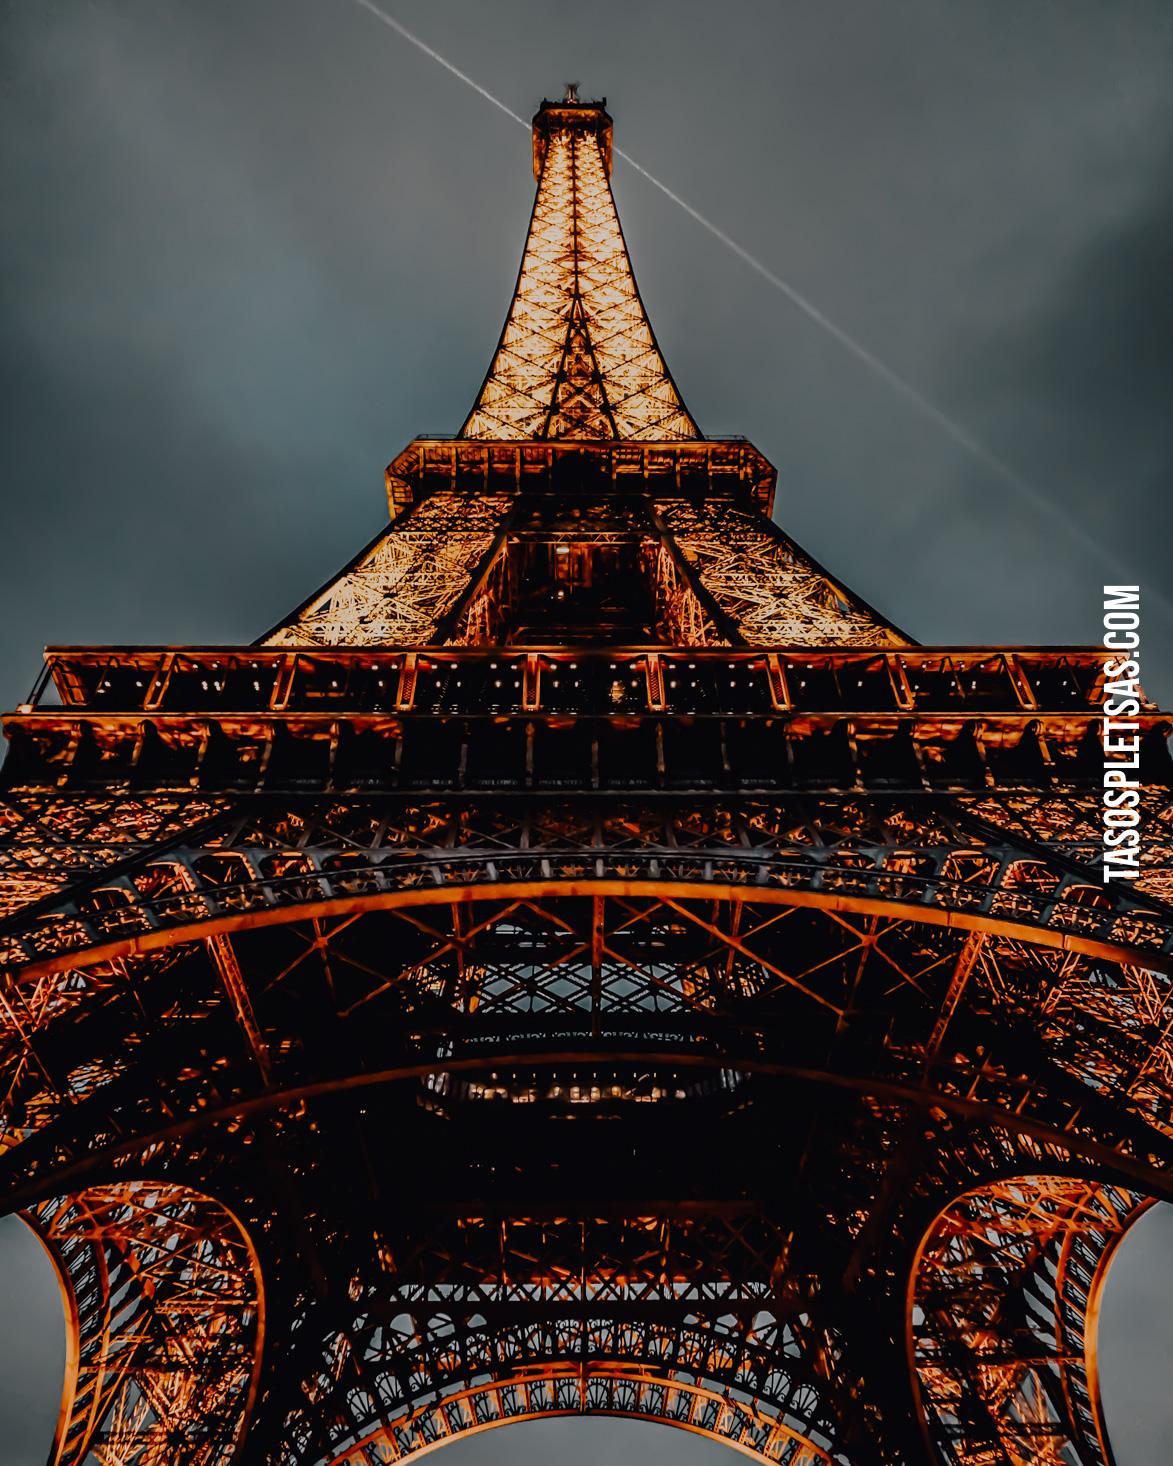 ParisWEB-Paris-DSC08697-NR.jpg